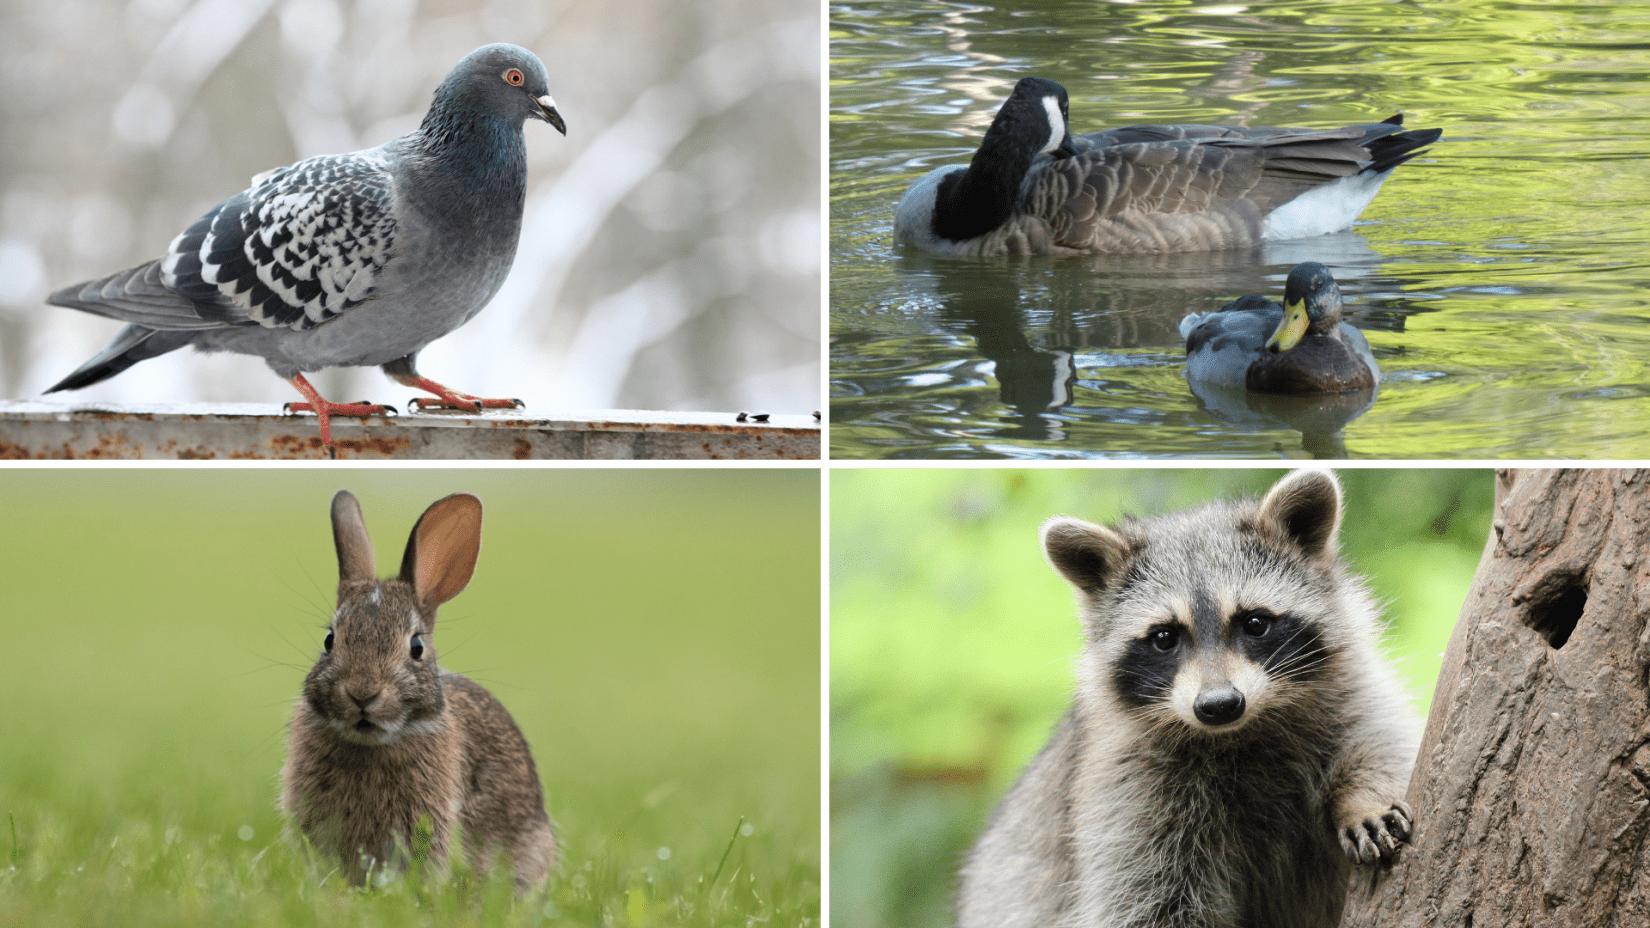 Collage of adult wild animals - pigeon, Canada goose & mallard, cottontail rabbit, raccoon